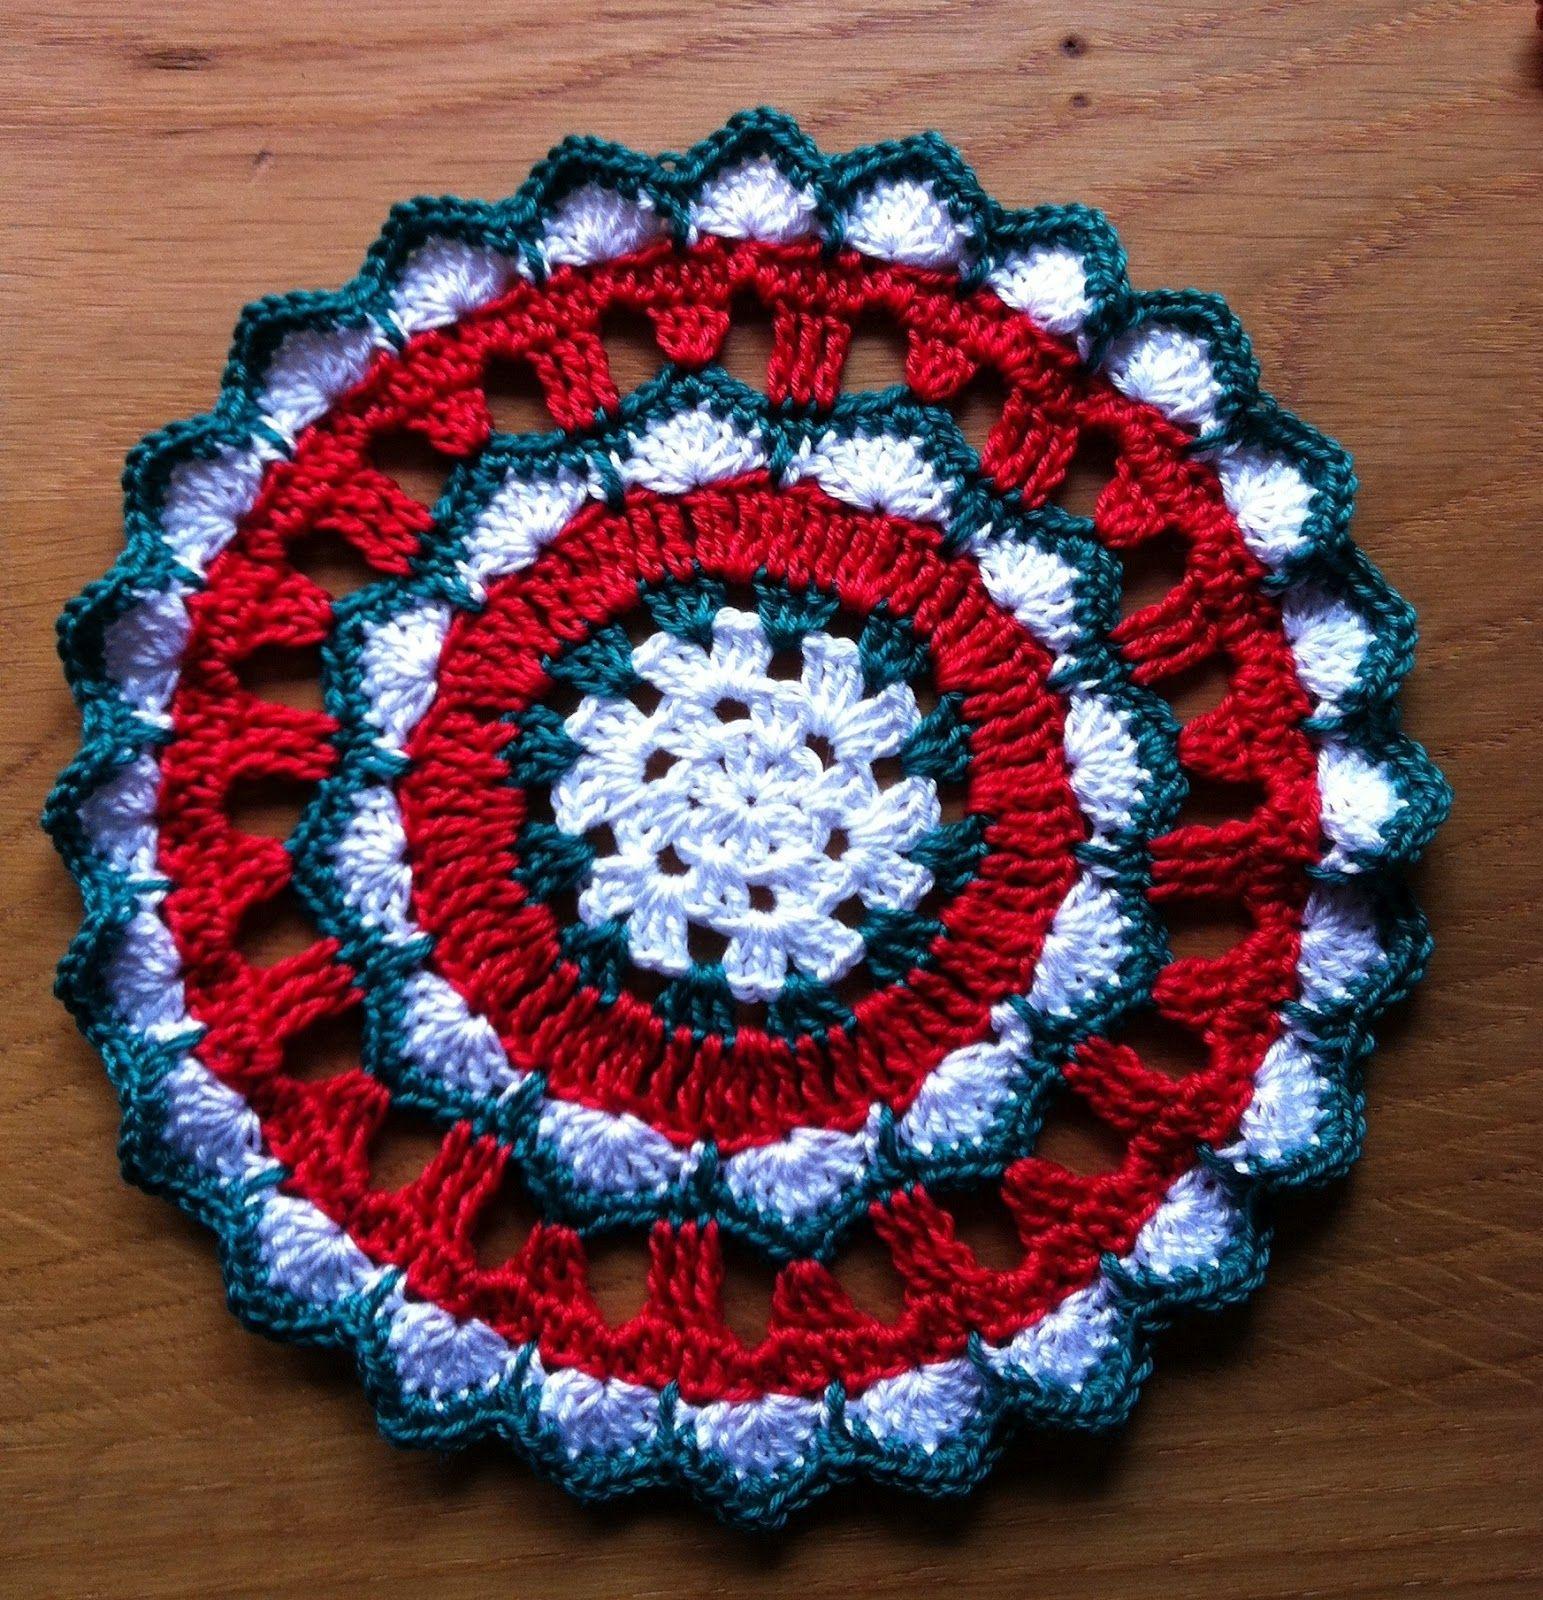 Crochet Mandala In Christmas Colors Pinterest Trippy Hippy Afghan Pattern Kingdom